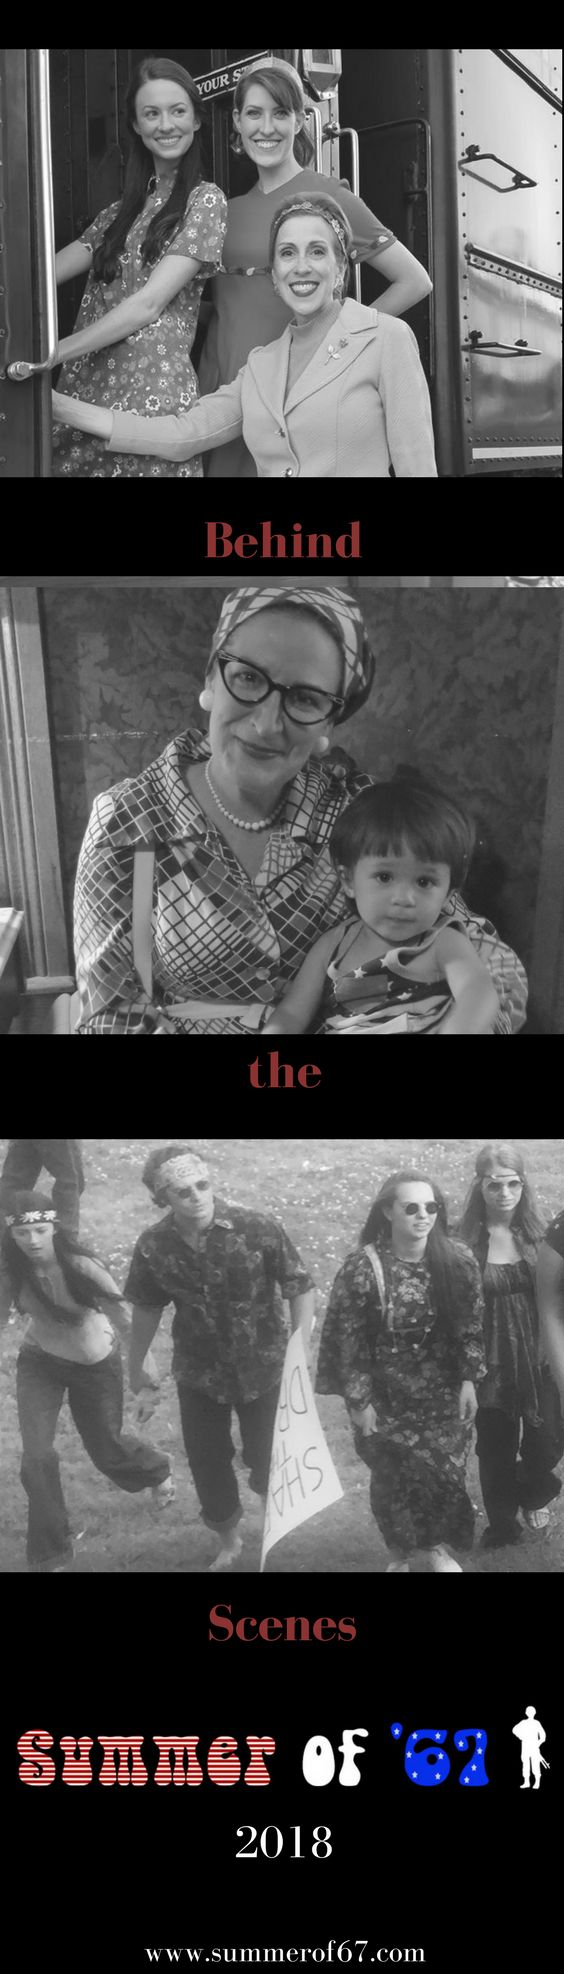 Summer of '67 behind the scenes, Vietnam War love story, indie movie, coming 2018, www.summerof67.com, hippies, hippie protest, hippie fashions, vintage fashions, 1960's fashions, hippie style, period movie,